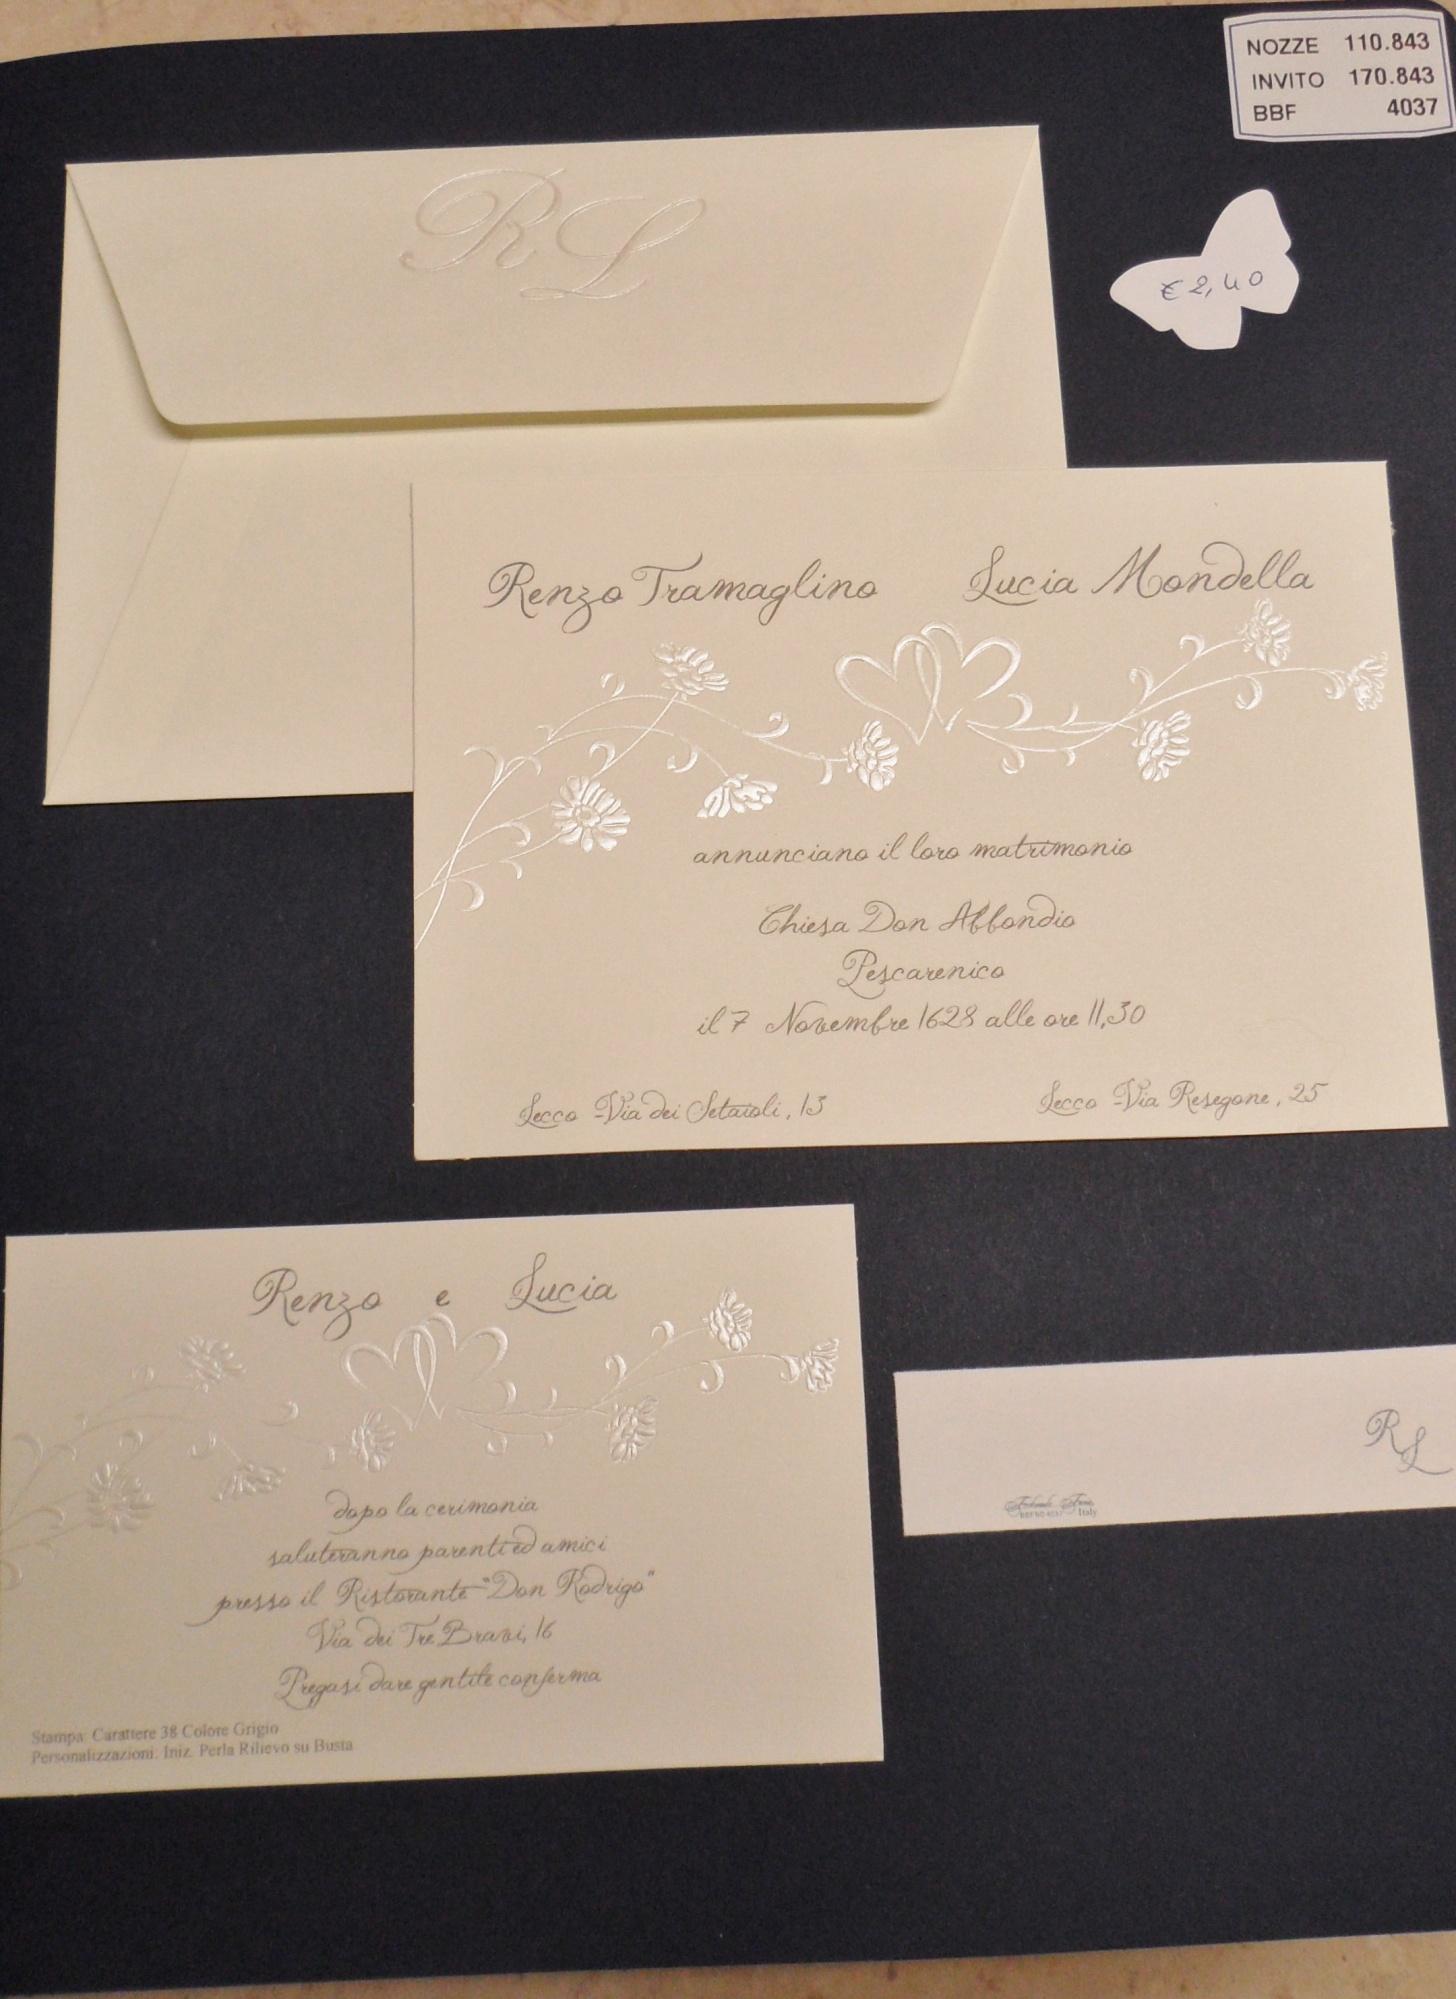 Costo Partecipazioni Matrimonio 2018.Partecipazioni Nozze Lux 2018 Originali Eleganti Spiritose